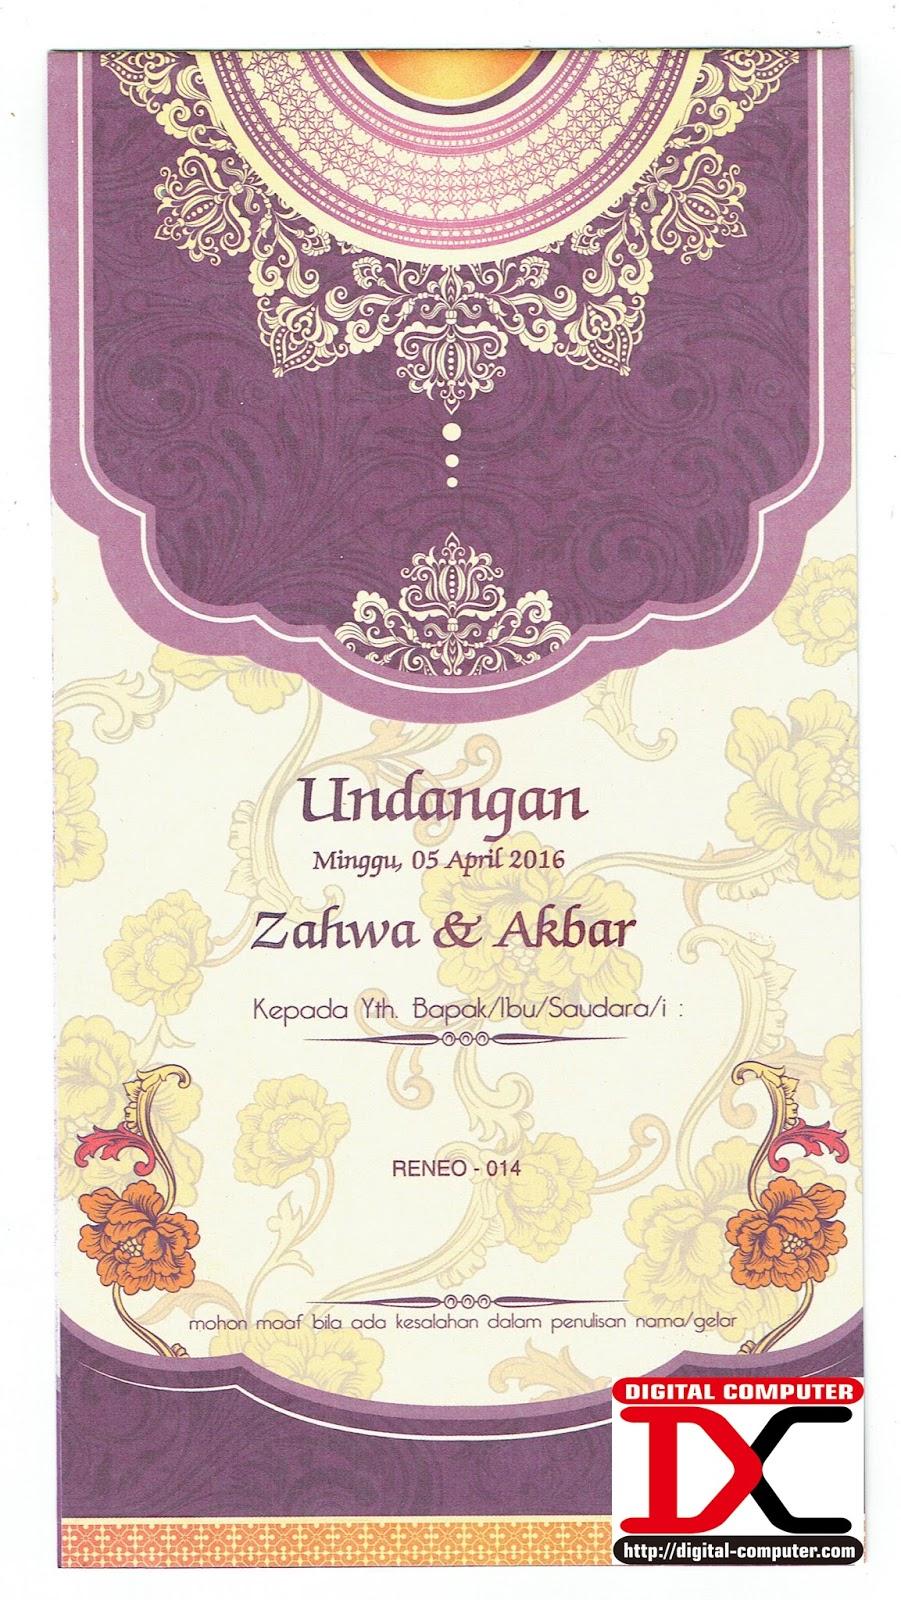 undangan pernikahan harga 2700